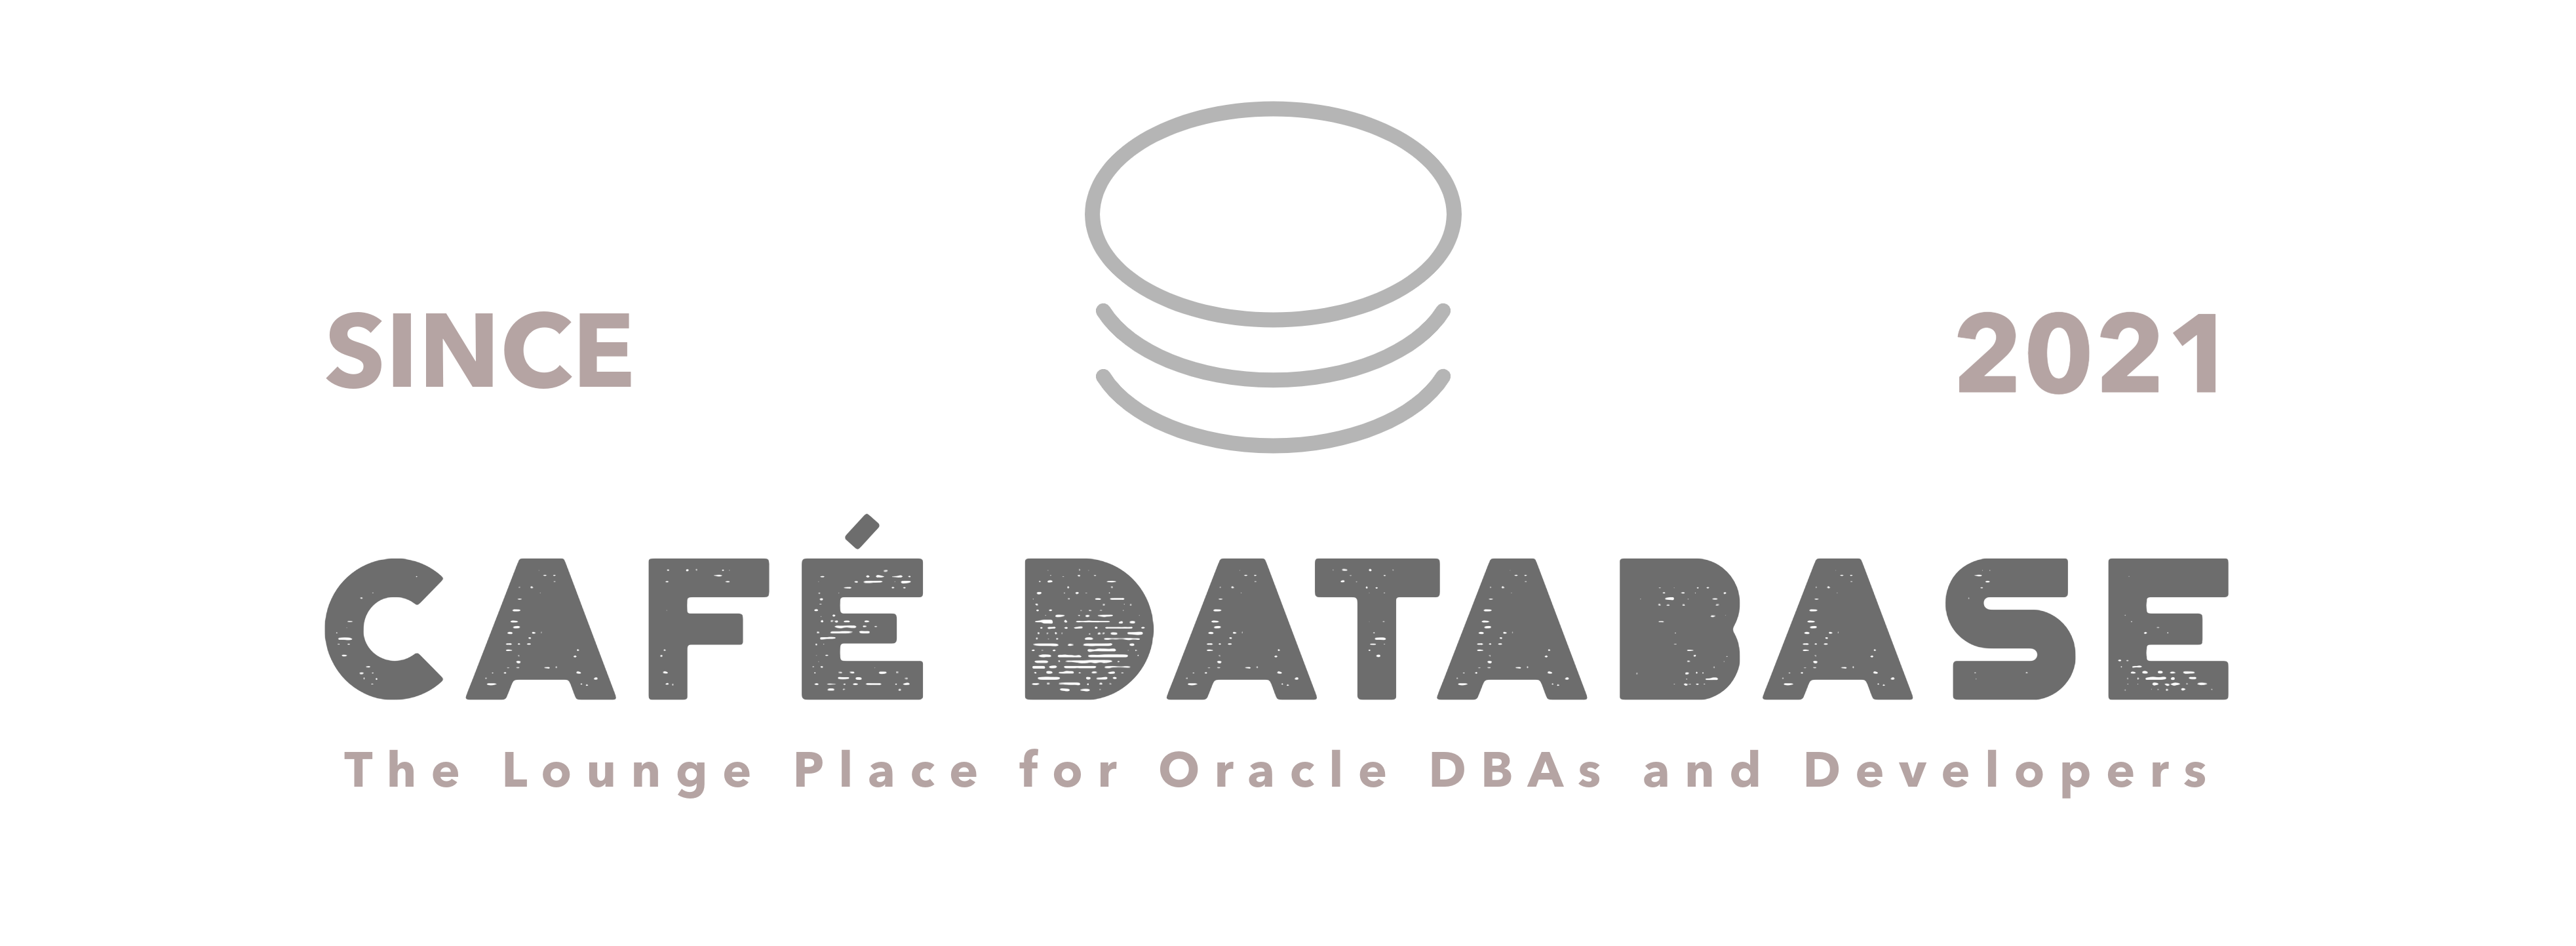 Café Database